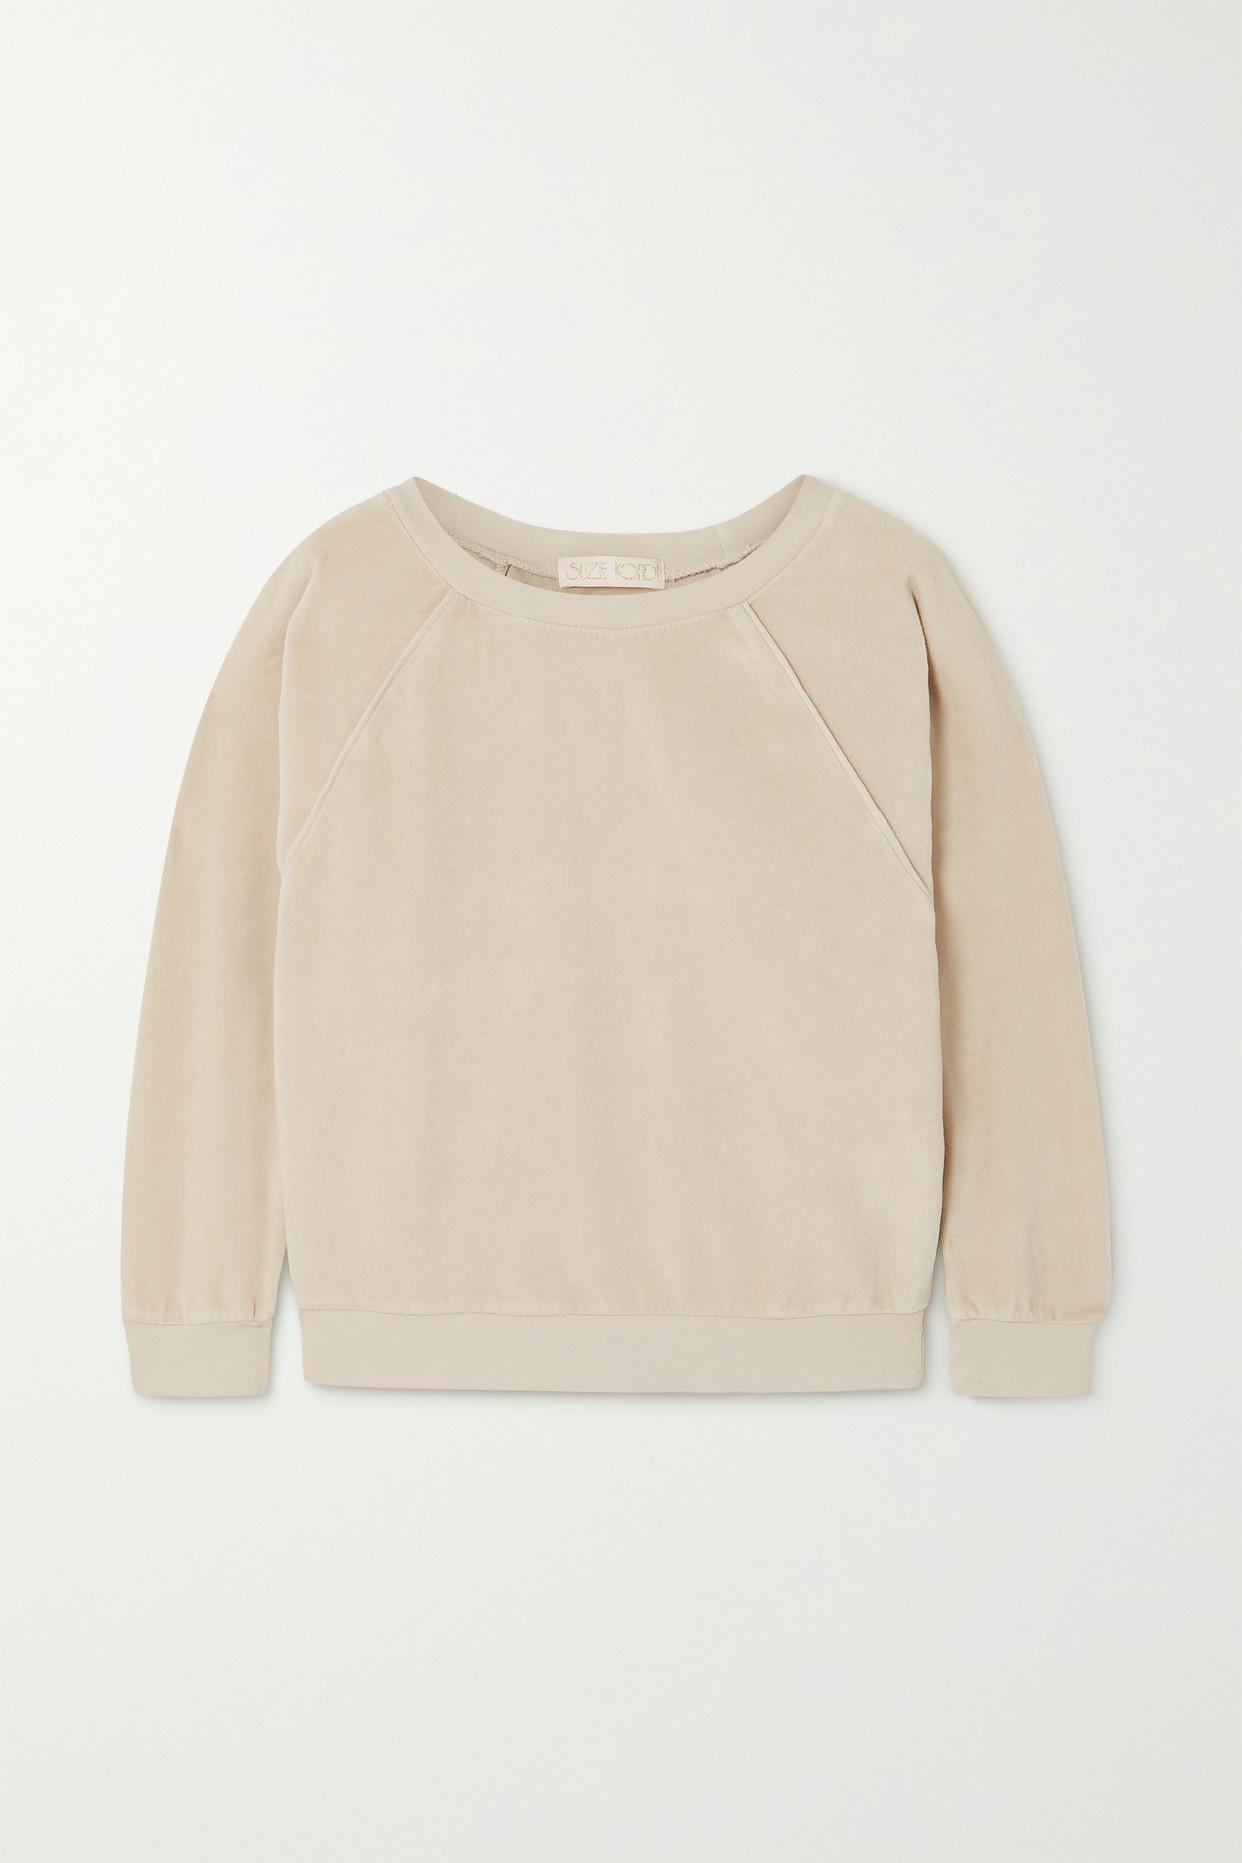 SUZIE KONDI - Cotton-blend Velour Sweatshirt - Off-white - x small